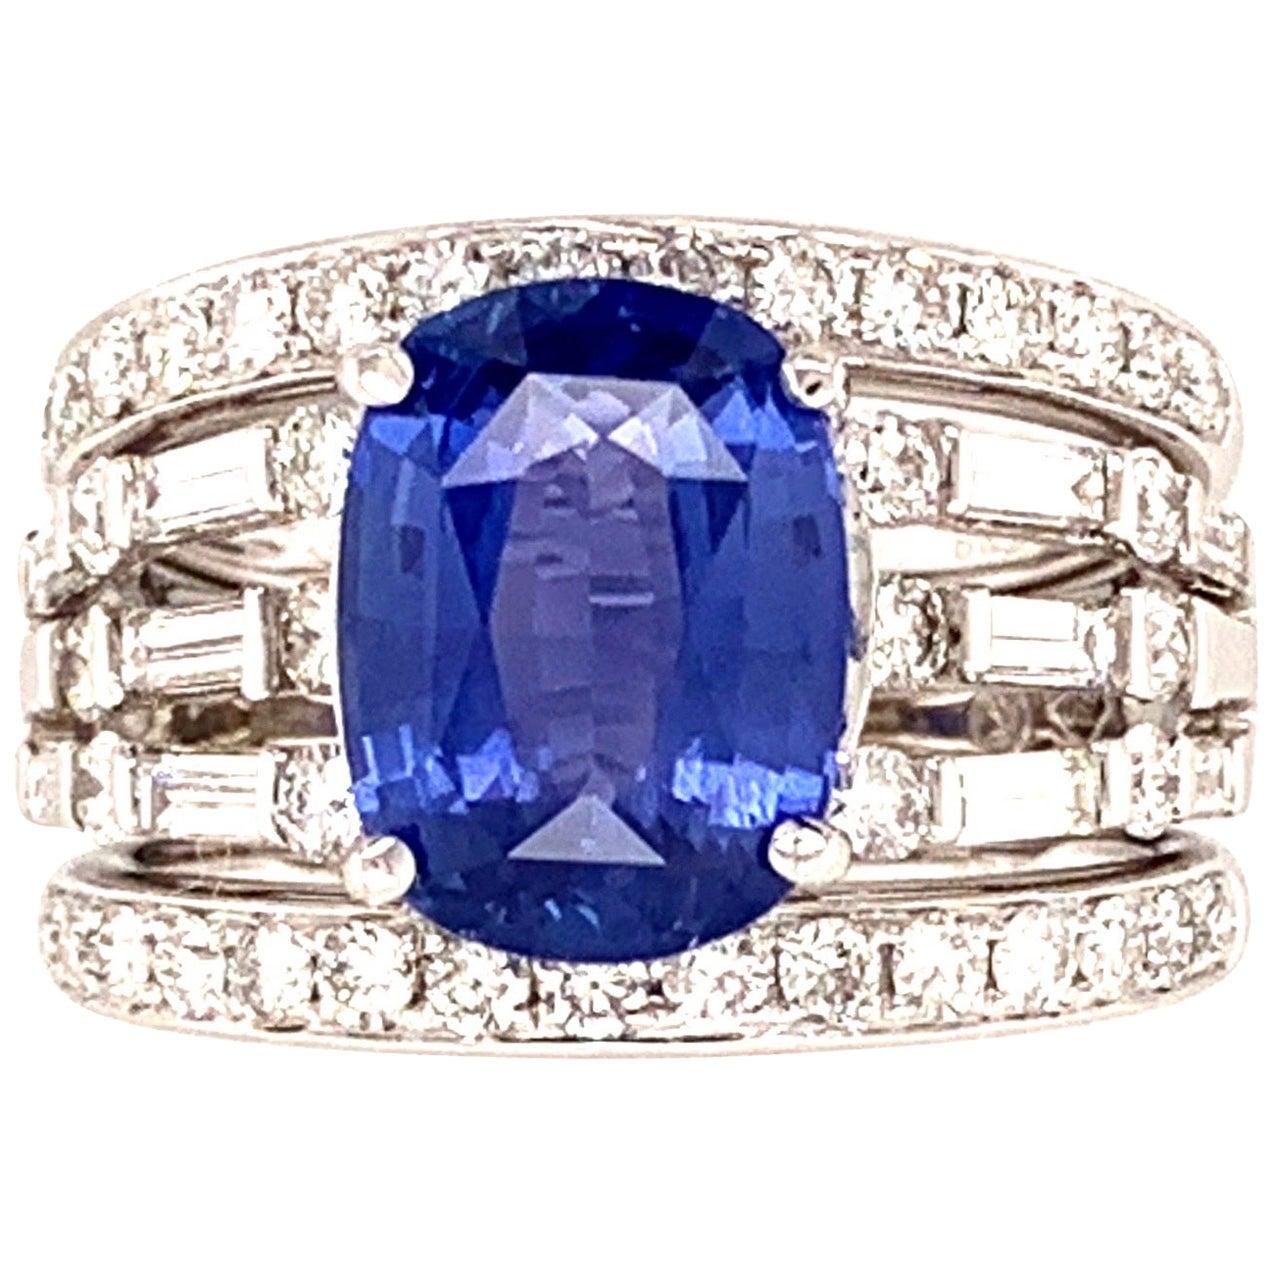 4.58 Carat Natural No Heat GIA Certified Sri Lankan Blue Sapphire Diamond Ring